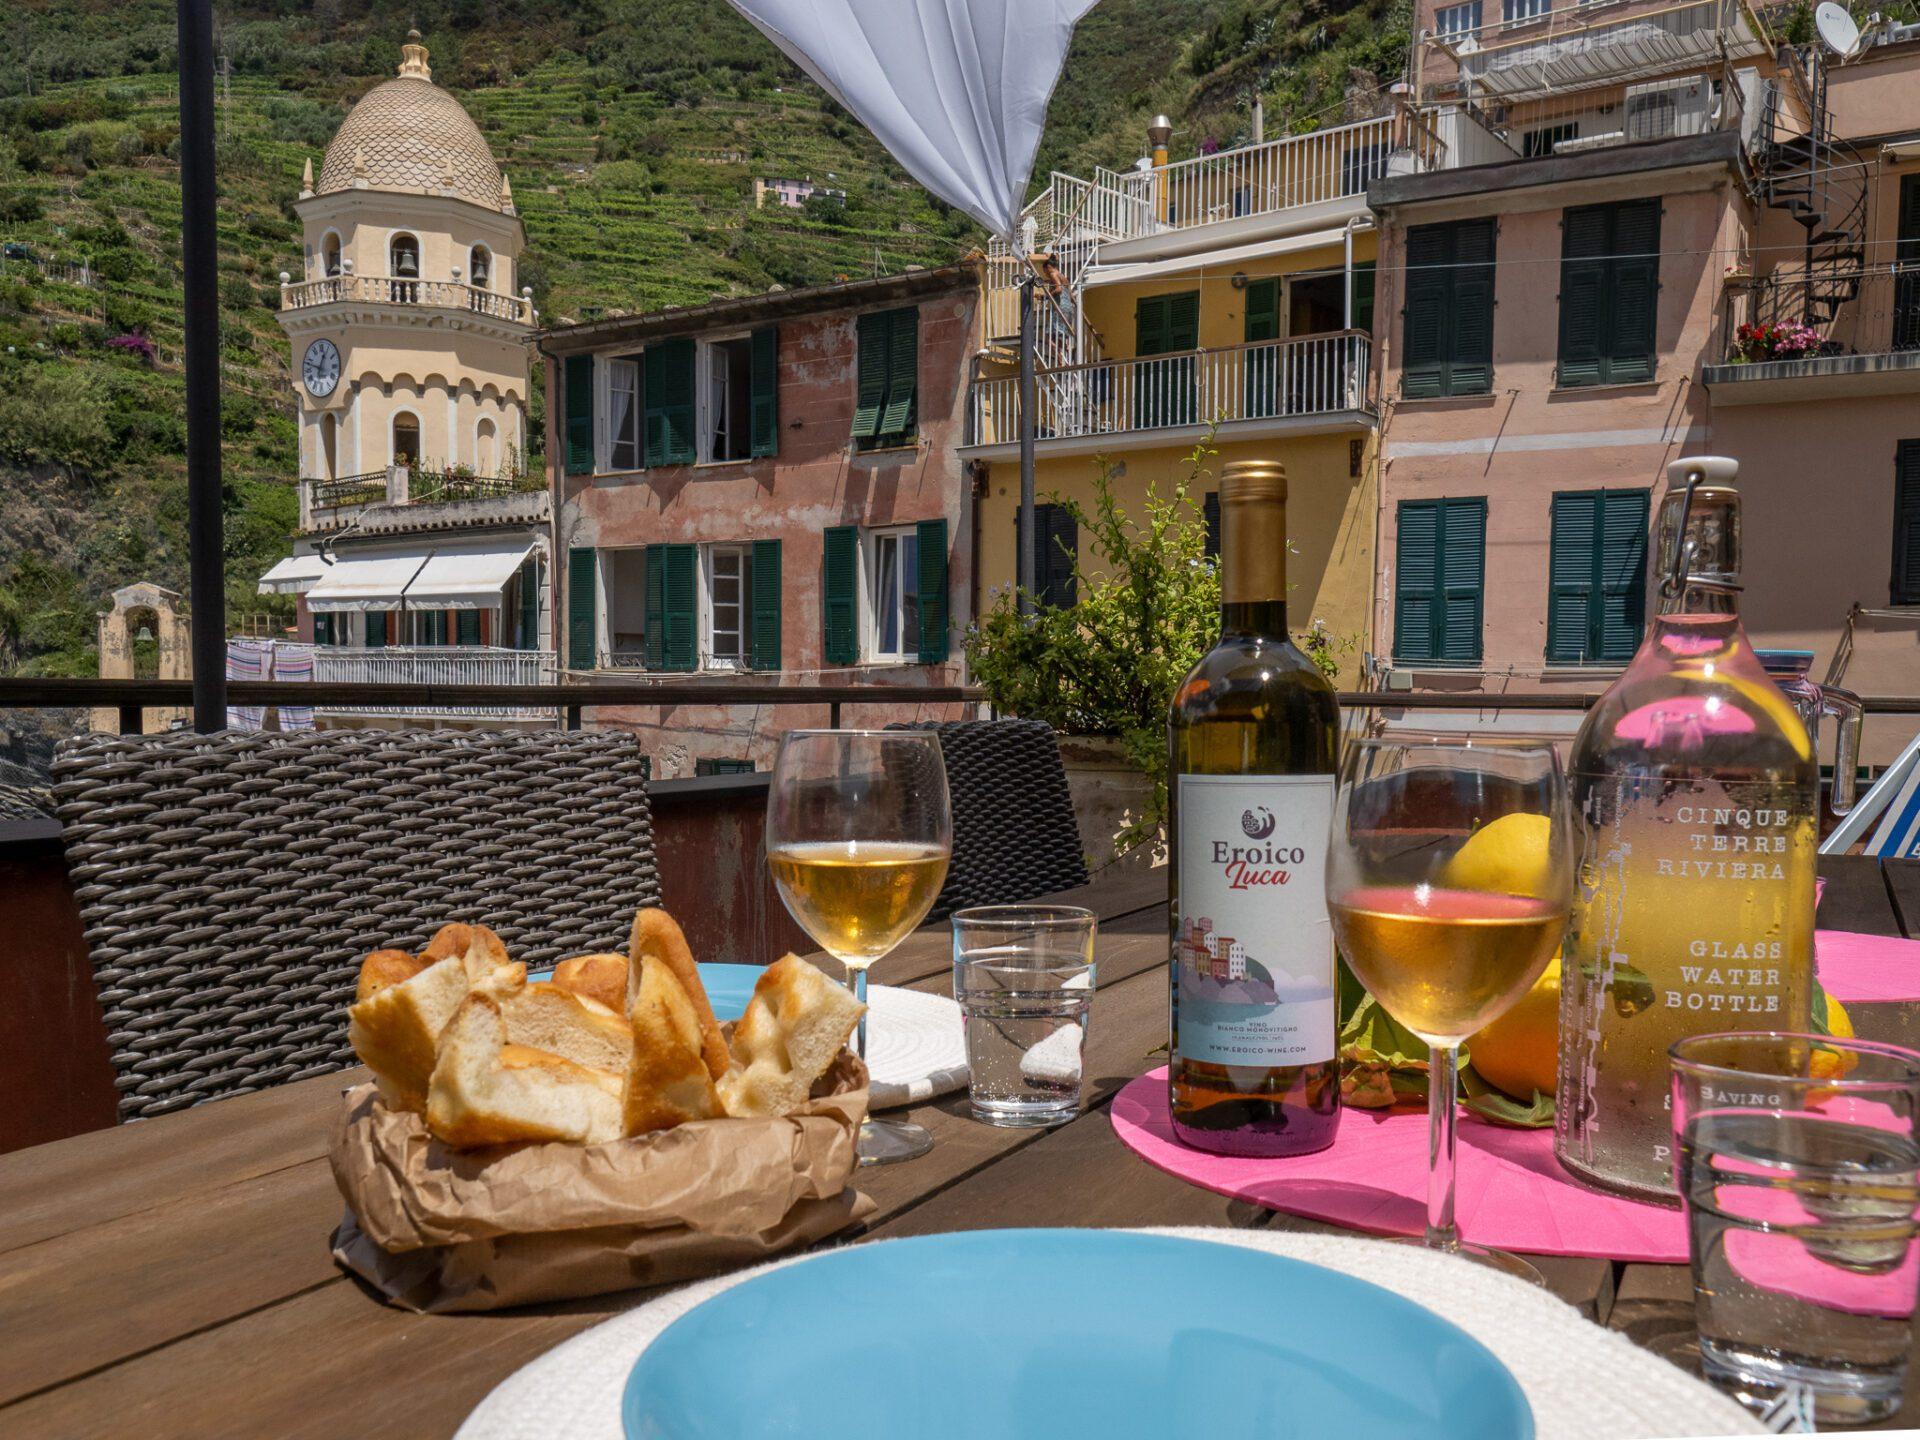 La Casa dell'Eroico Vino Exclusive Terrace